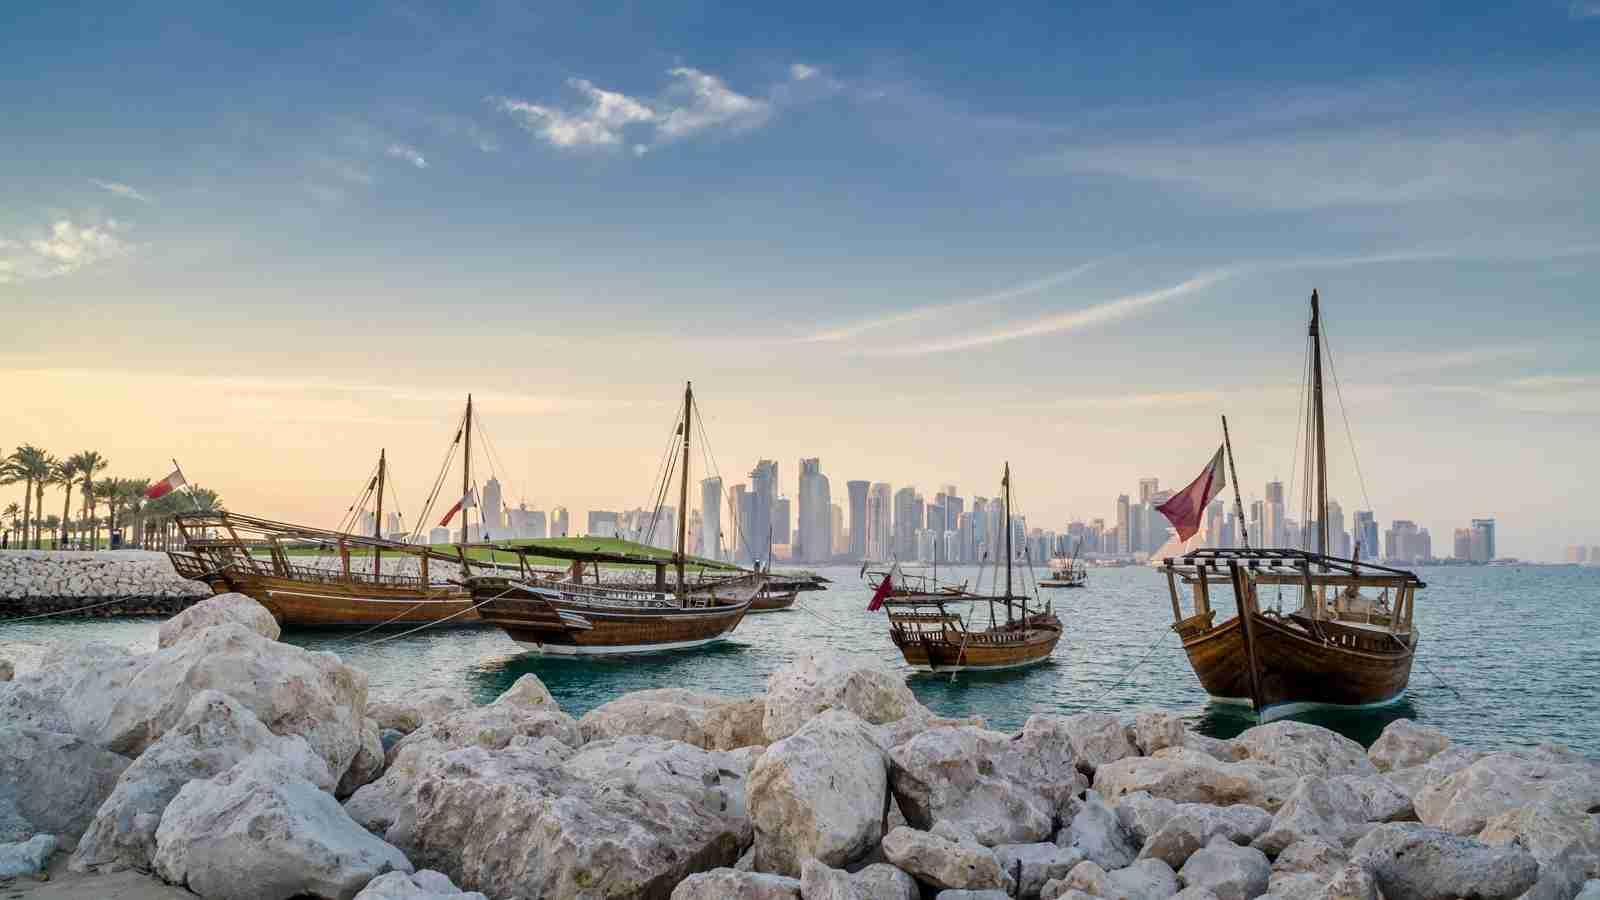 Doha, Qatar. (Photo by Fitria Ramli/EyeEm/Getty Images)